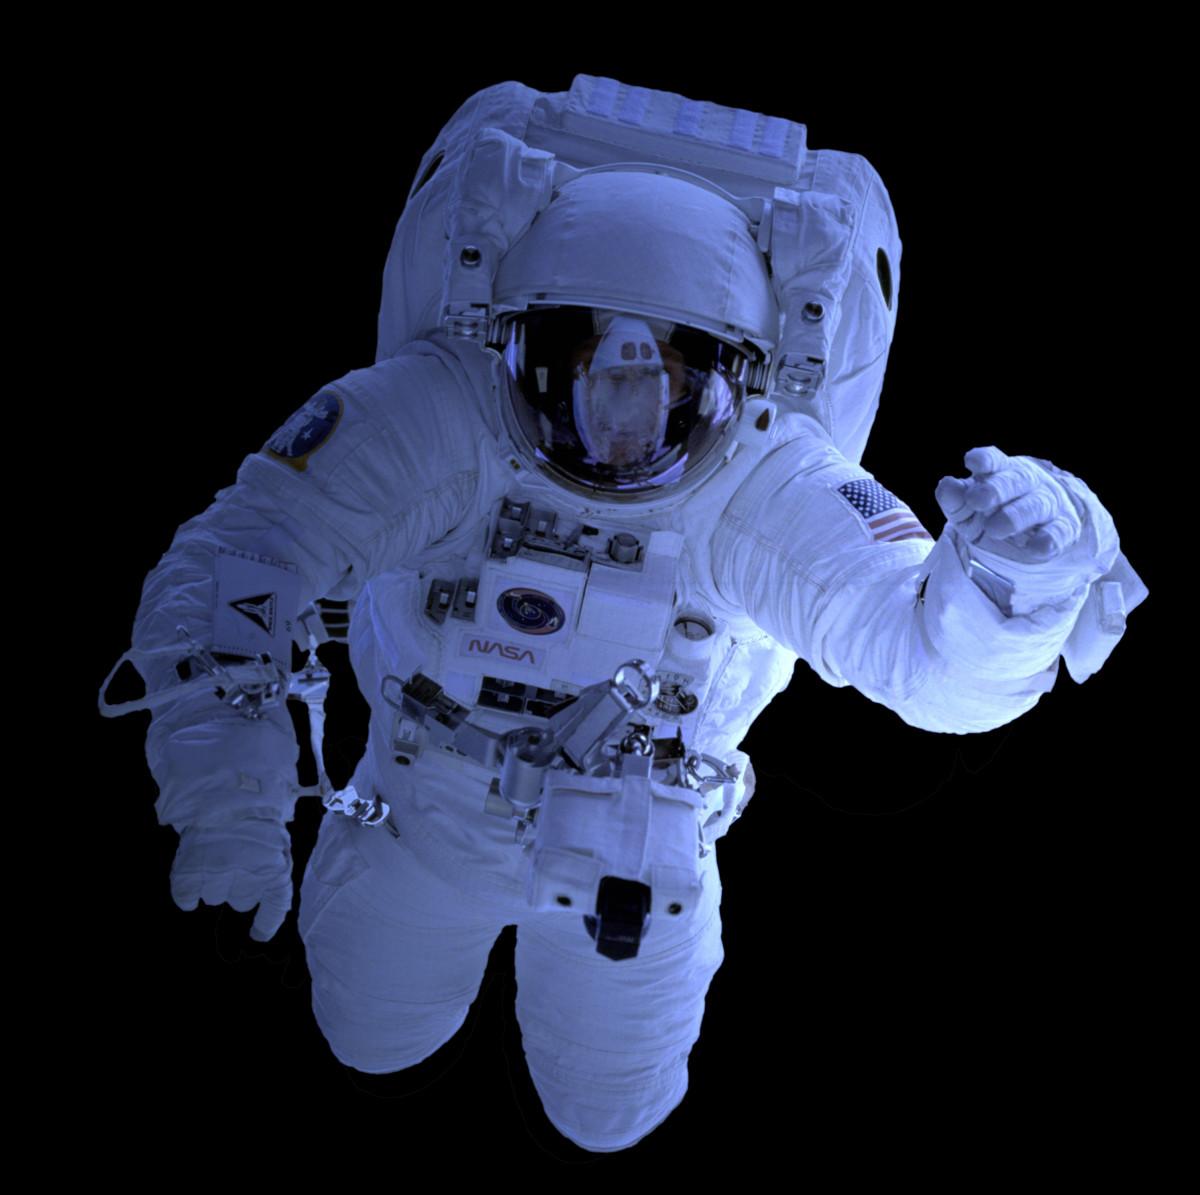 astronaut in spaceship - photo #24